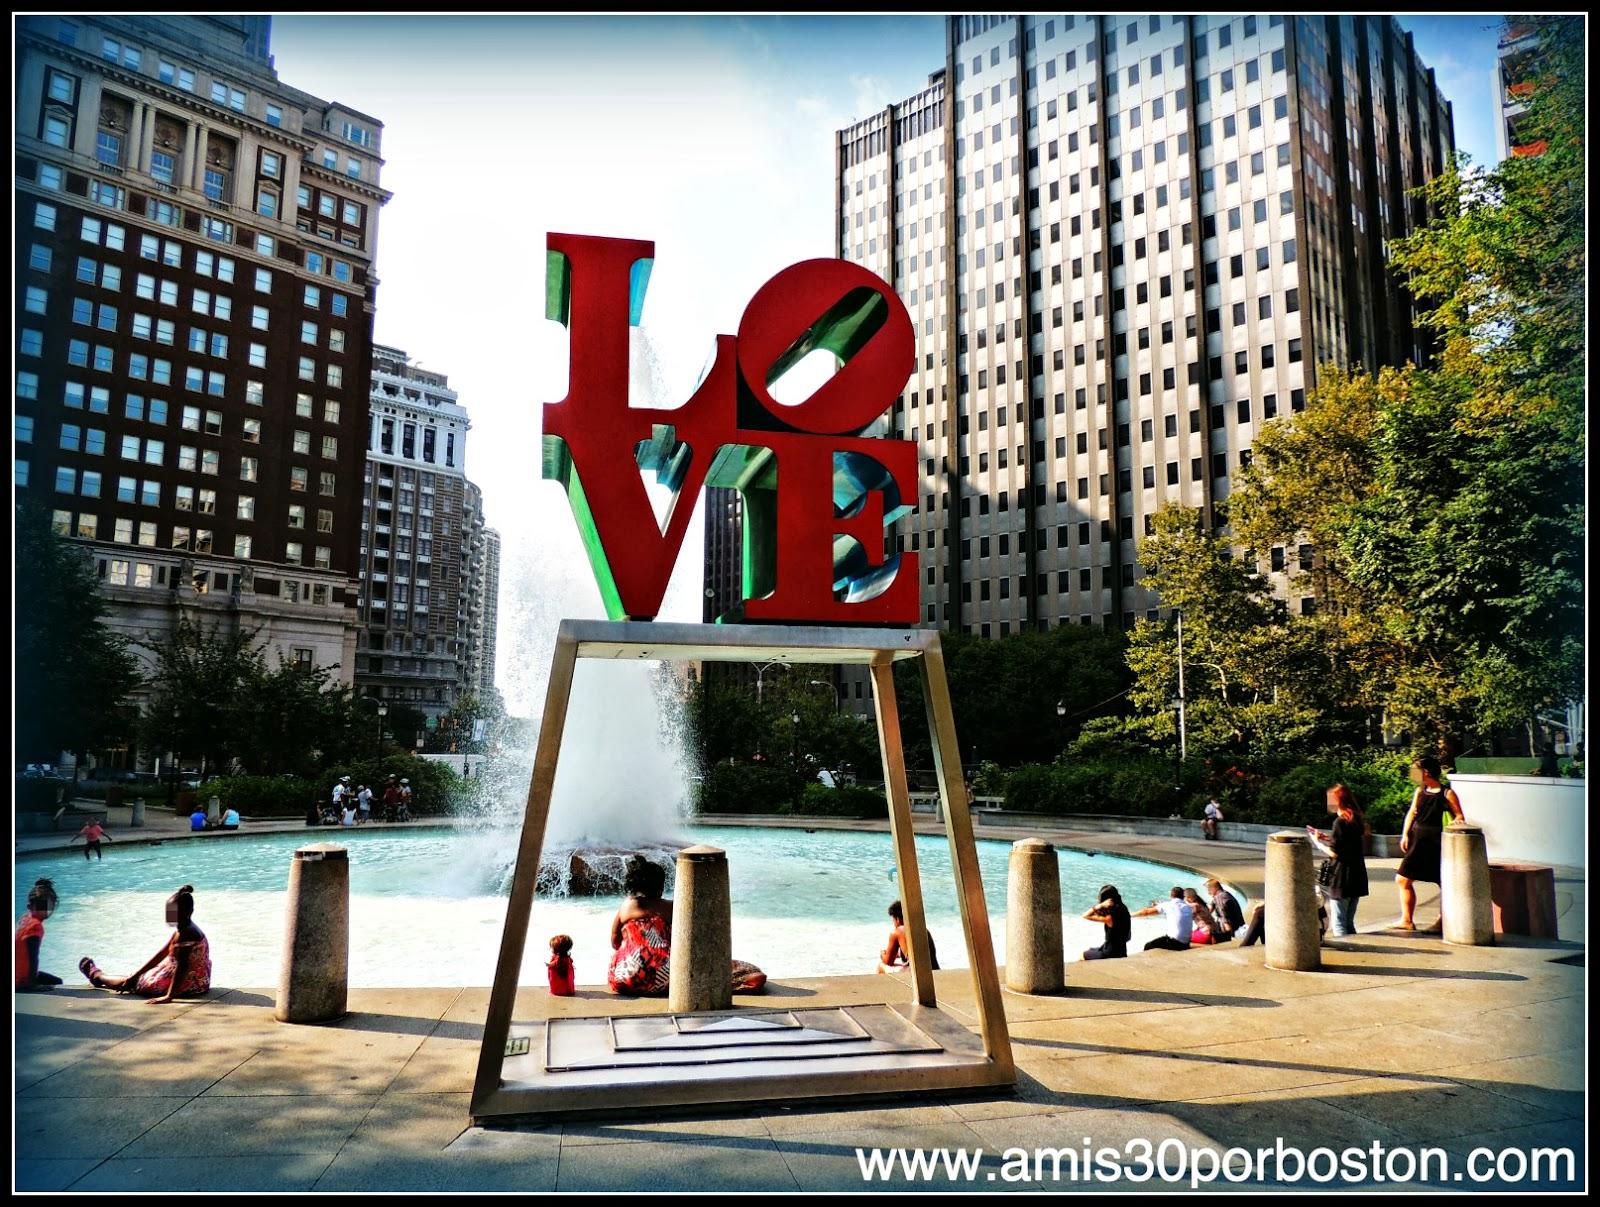 Filadelfia: Love Park